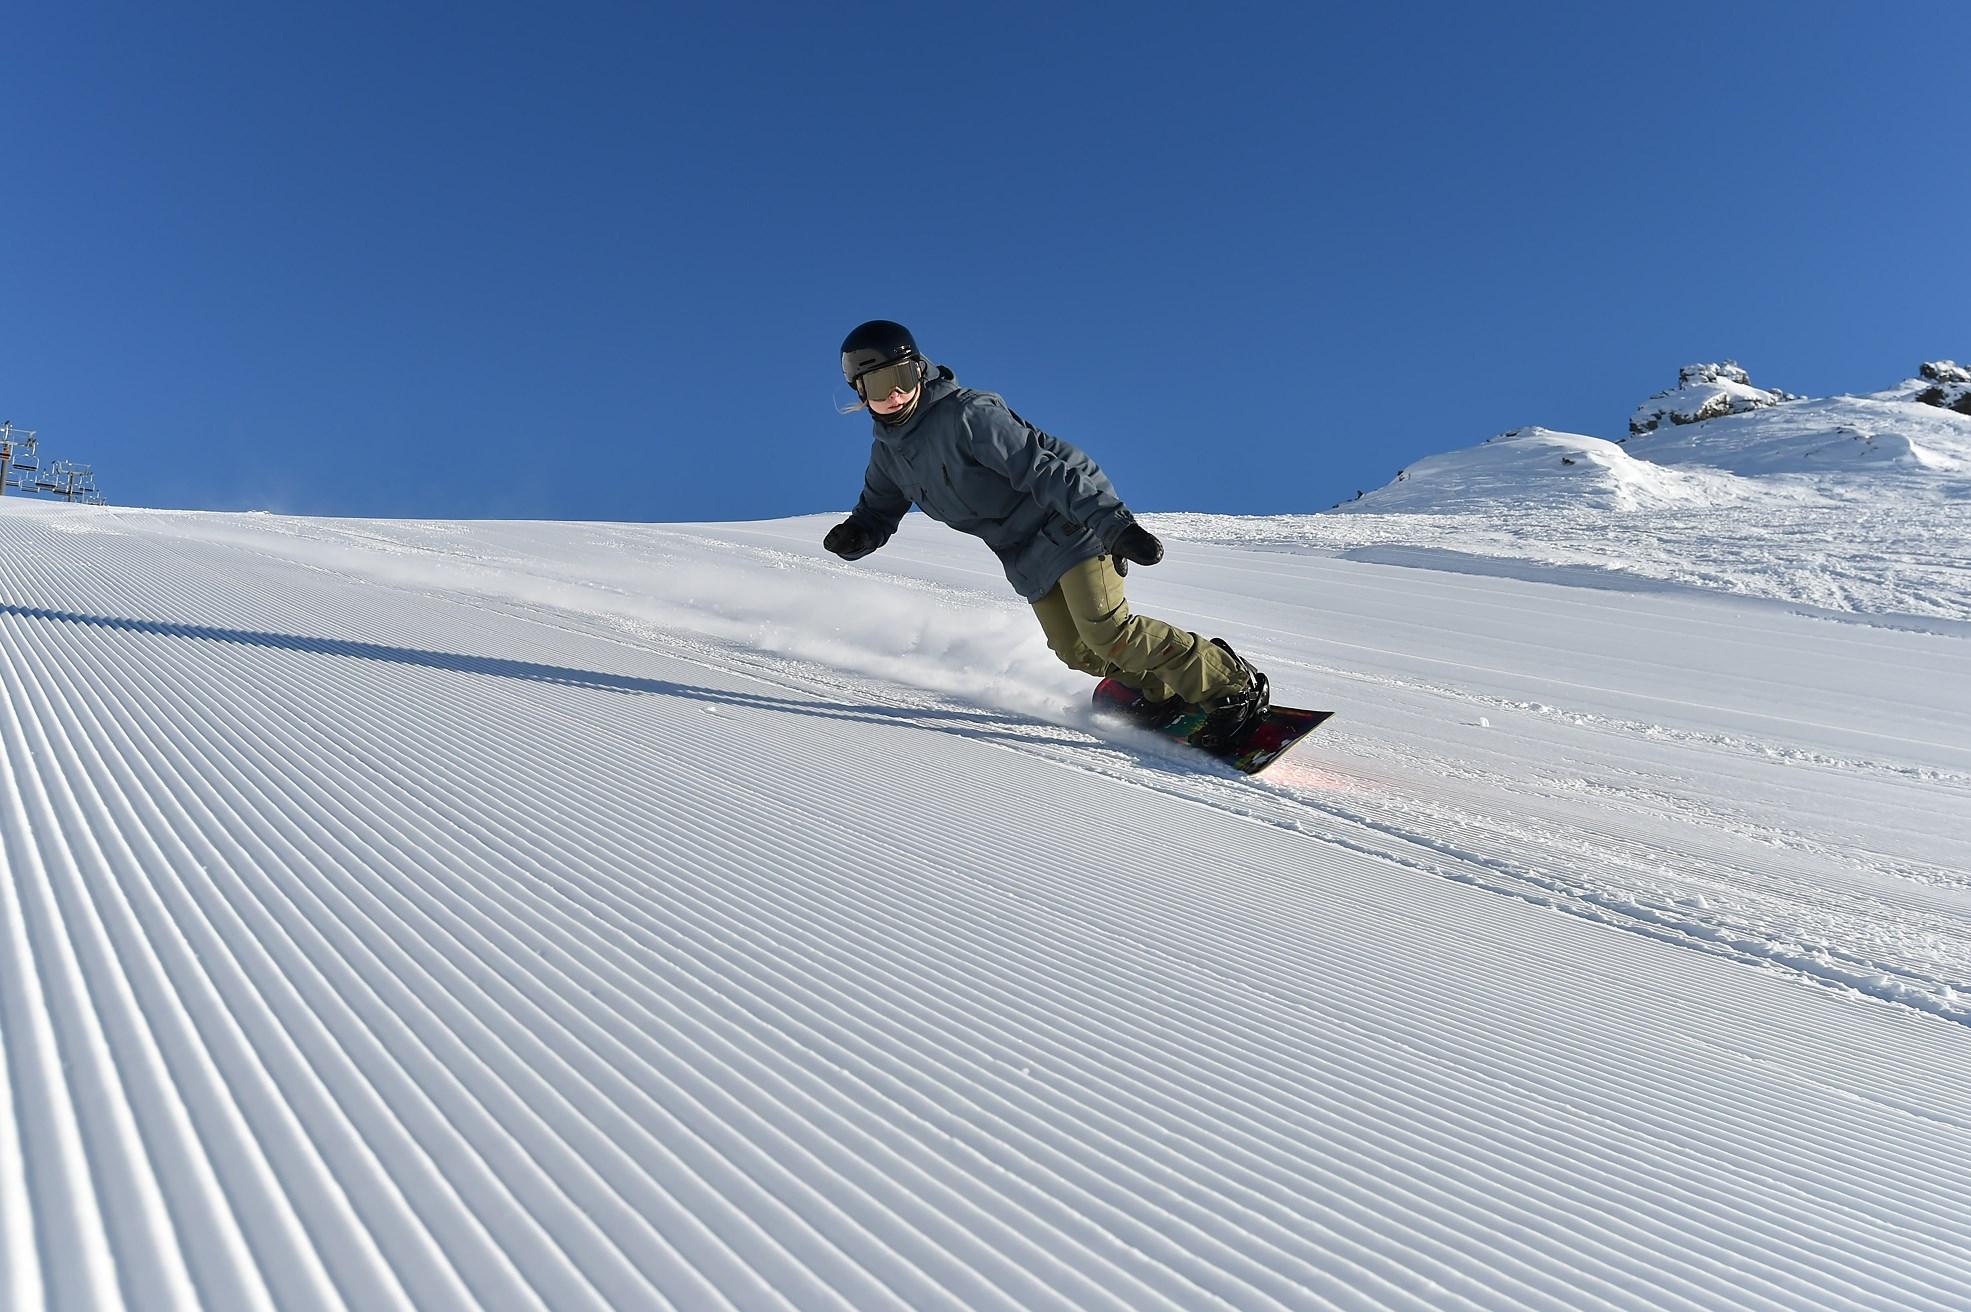 Snow boarding gif galleries 17